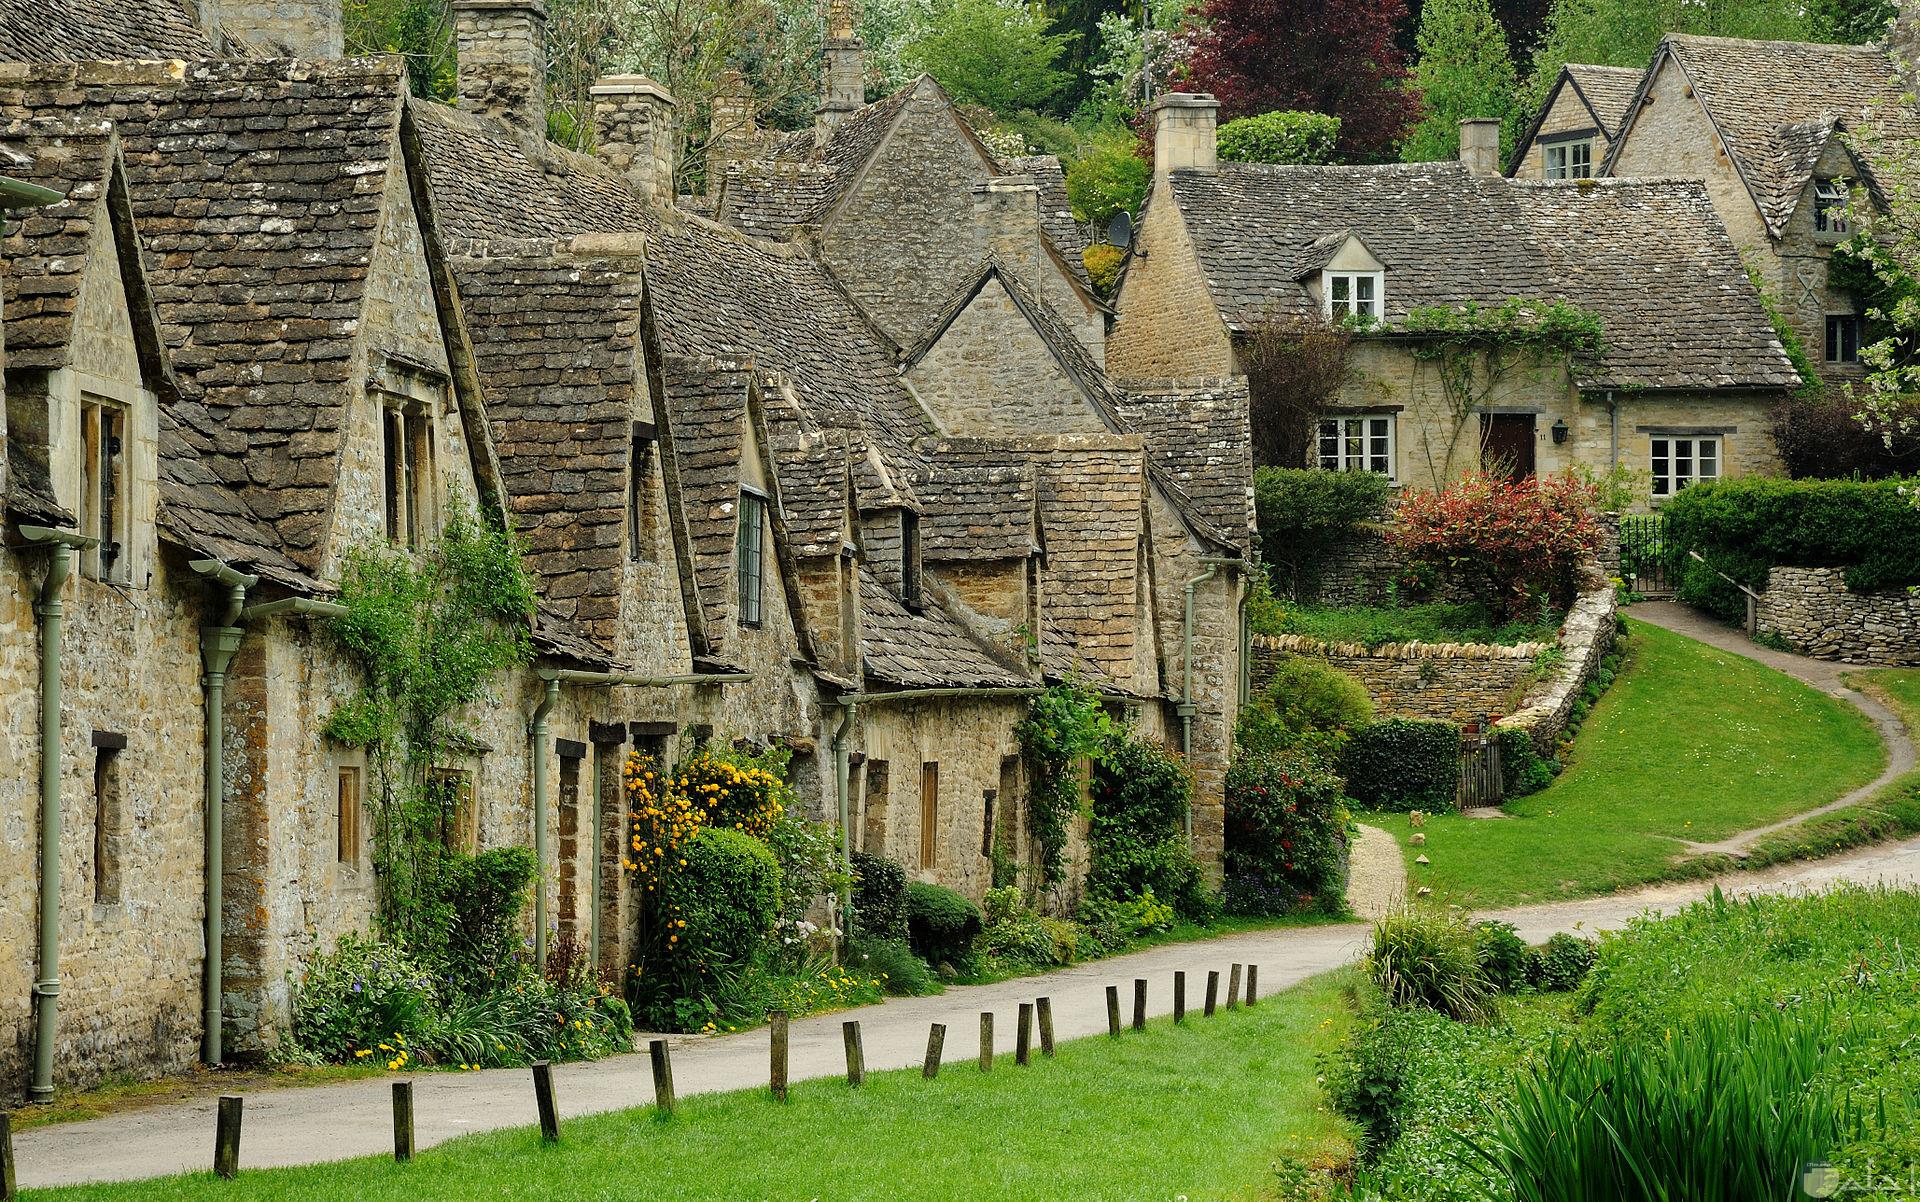 بيوت في ريف انجلترا.